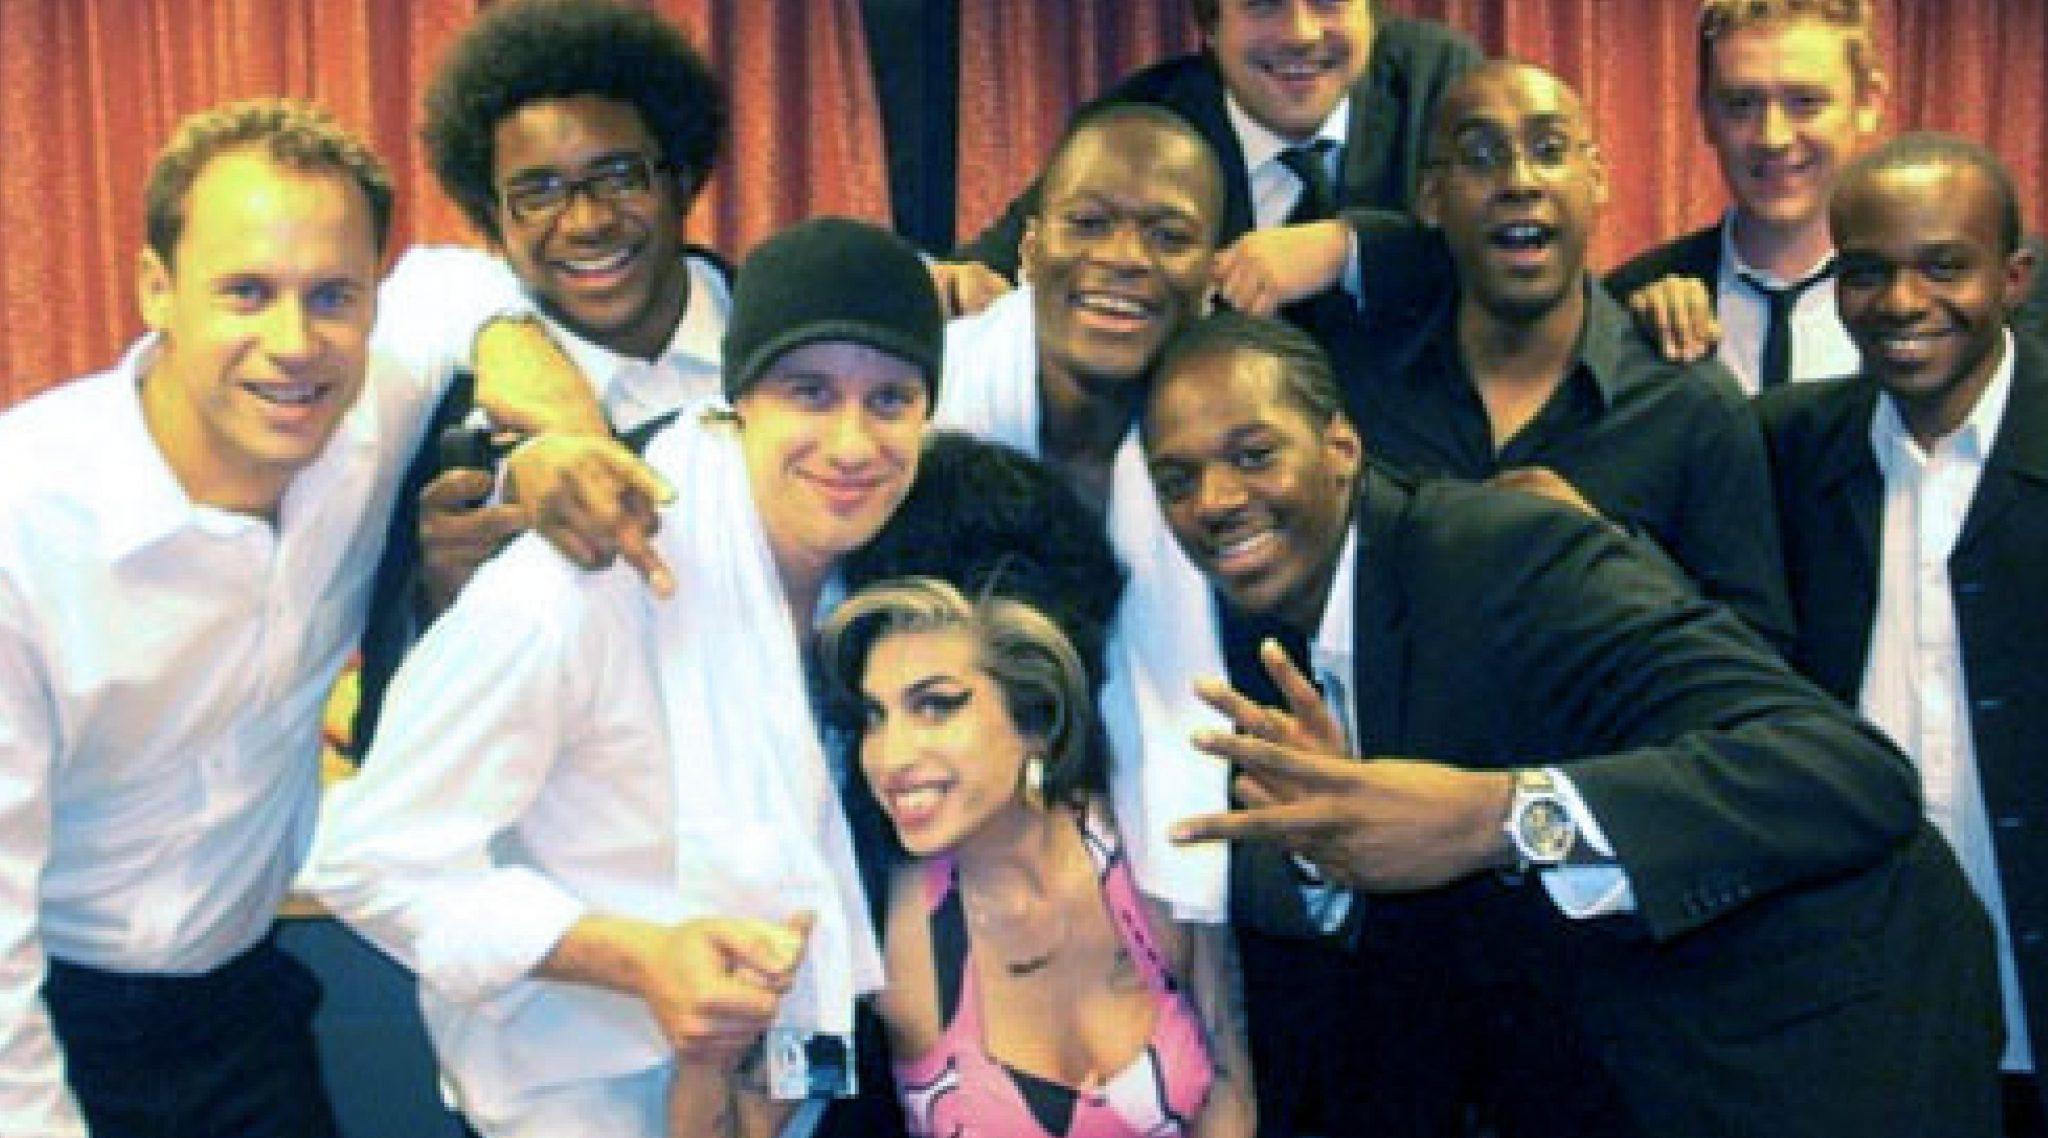 The Winehouse Originals